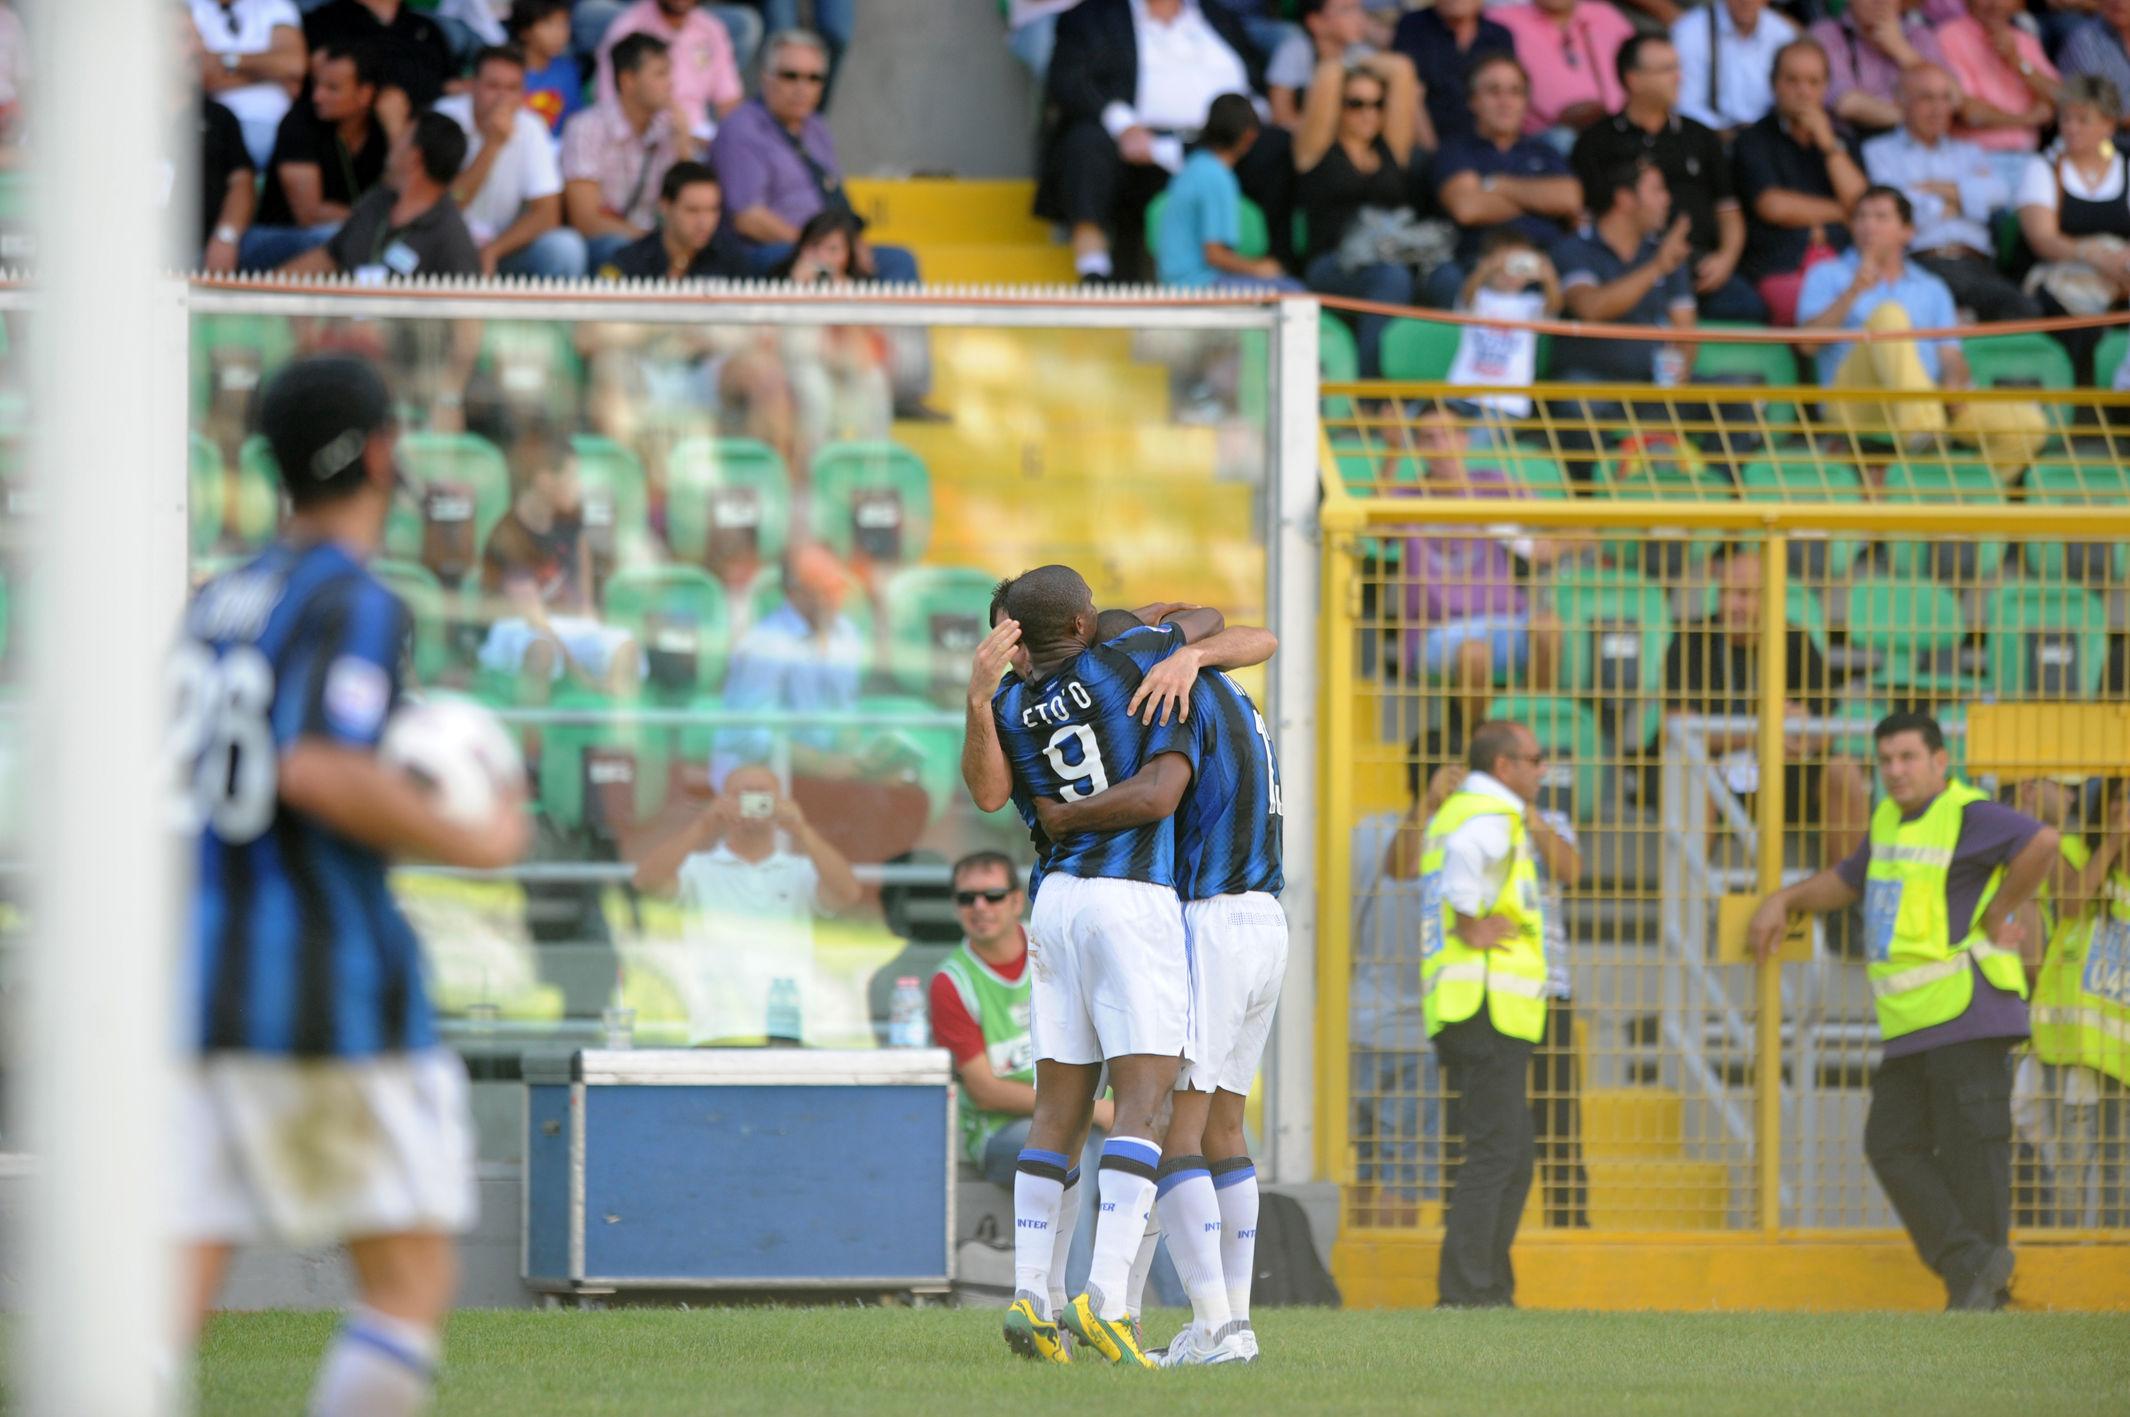 Palermo v Inter from 2010/11